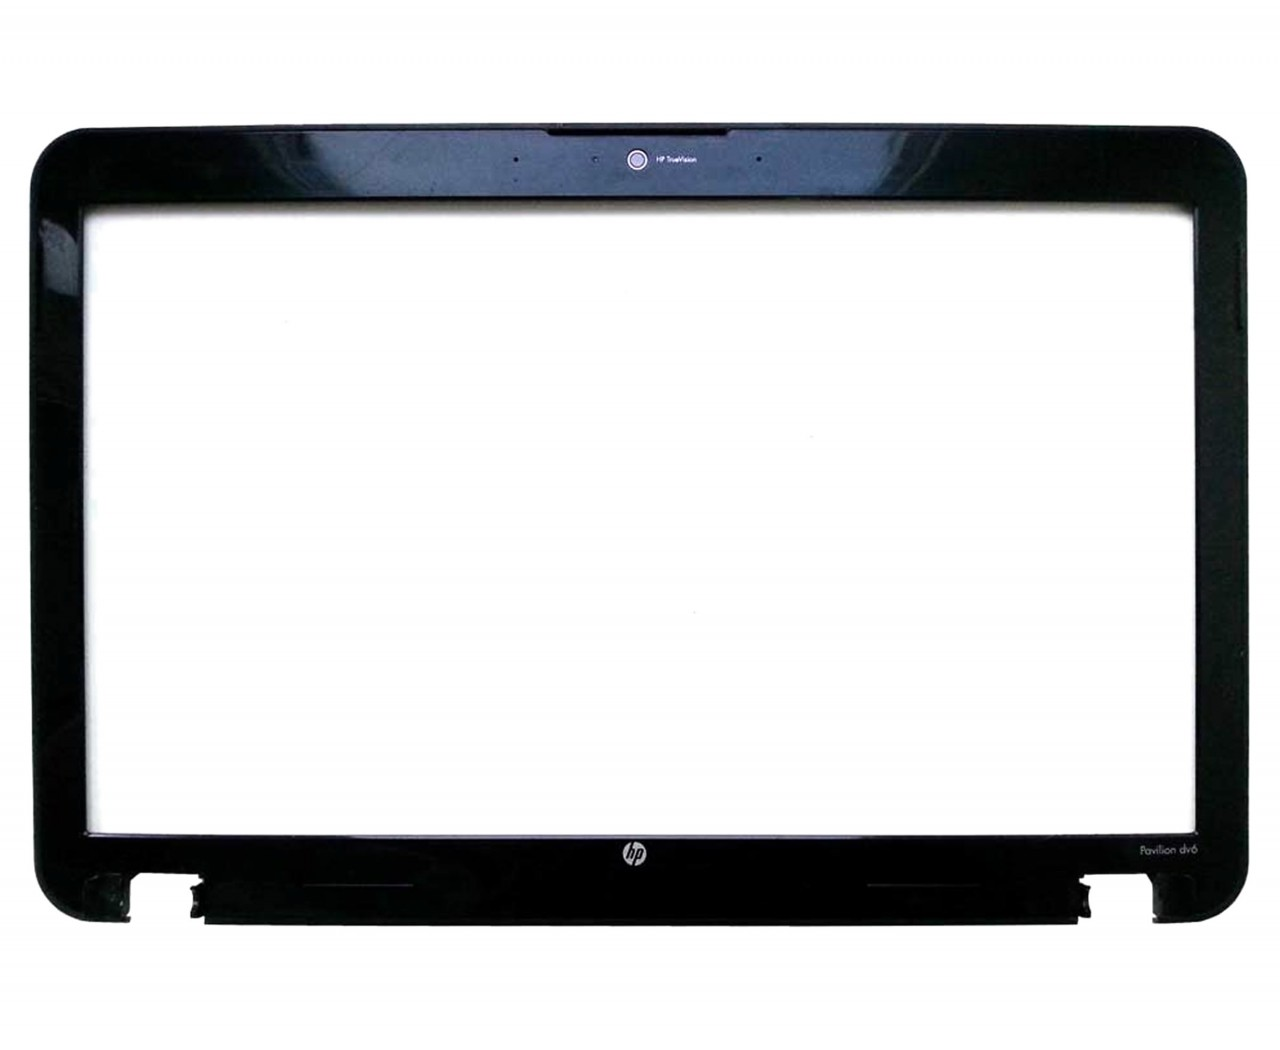 Rama Display HP DV6 3000 Bezel Front Cover Neagra imagine powerlaptop.ro 2021